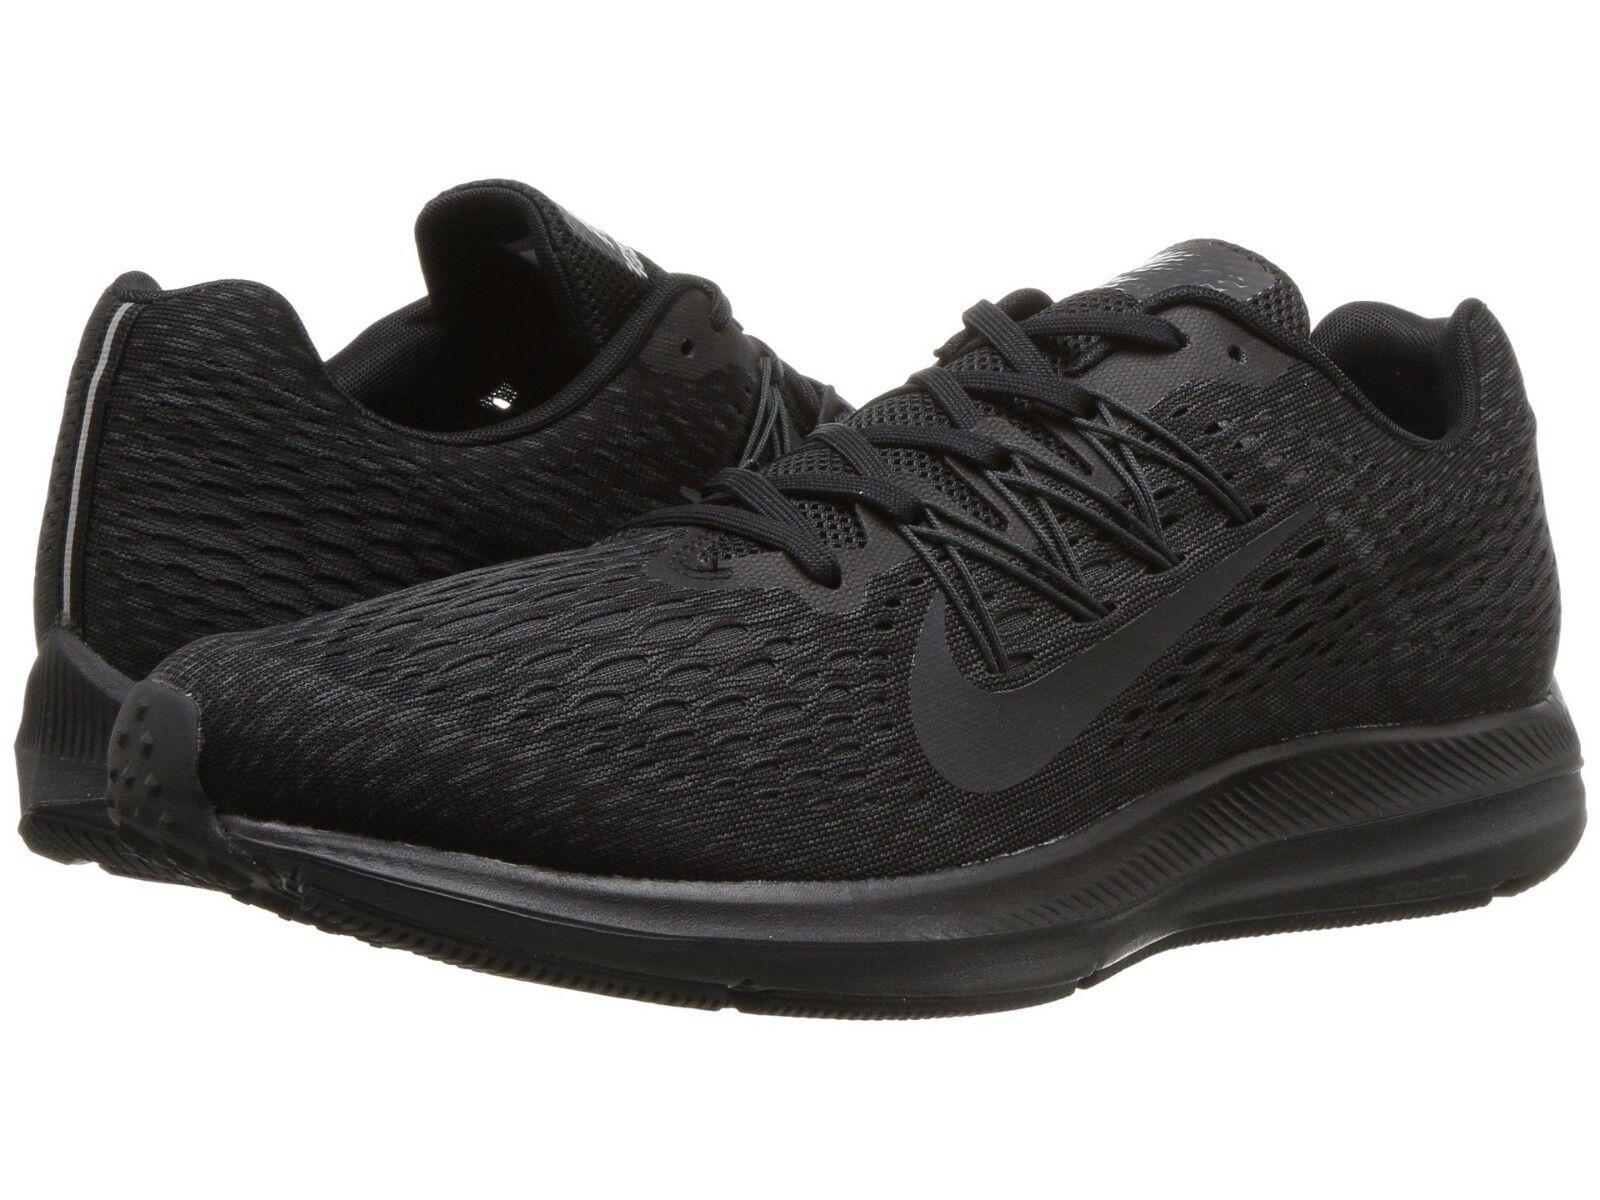 AA7406-002 Men's Nike Air Zoom Winflo 5 Running Shoes Black Sizes 8-12 NIB